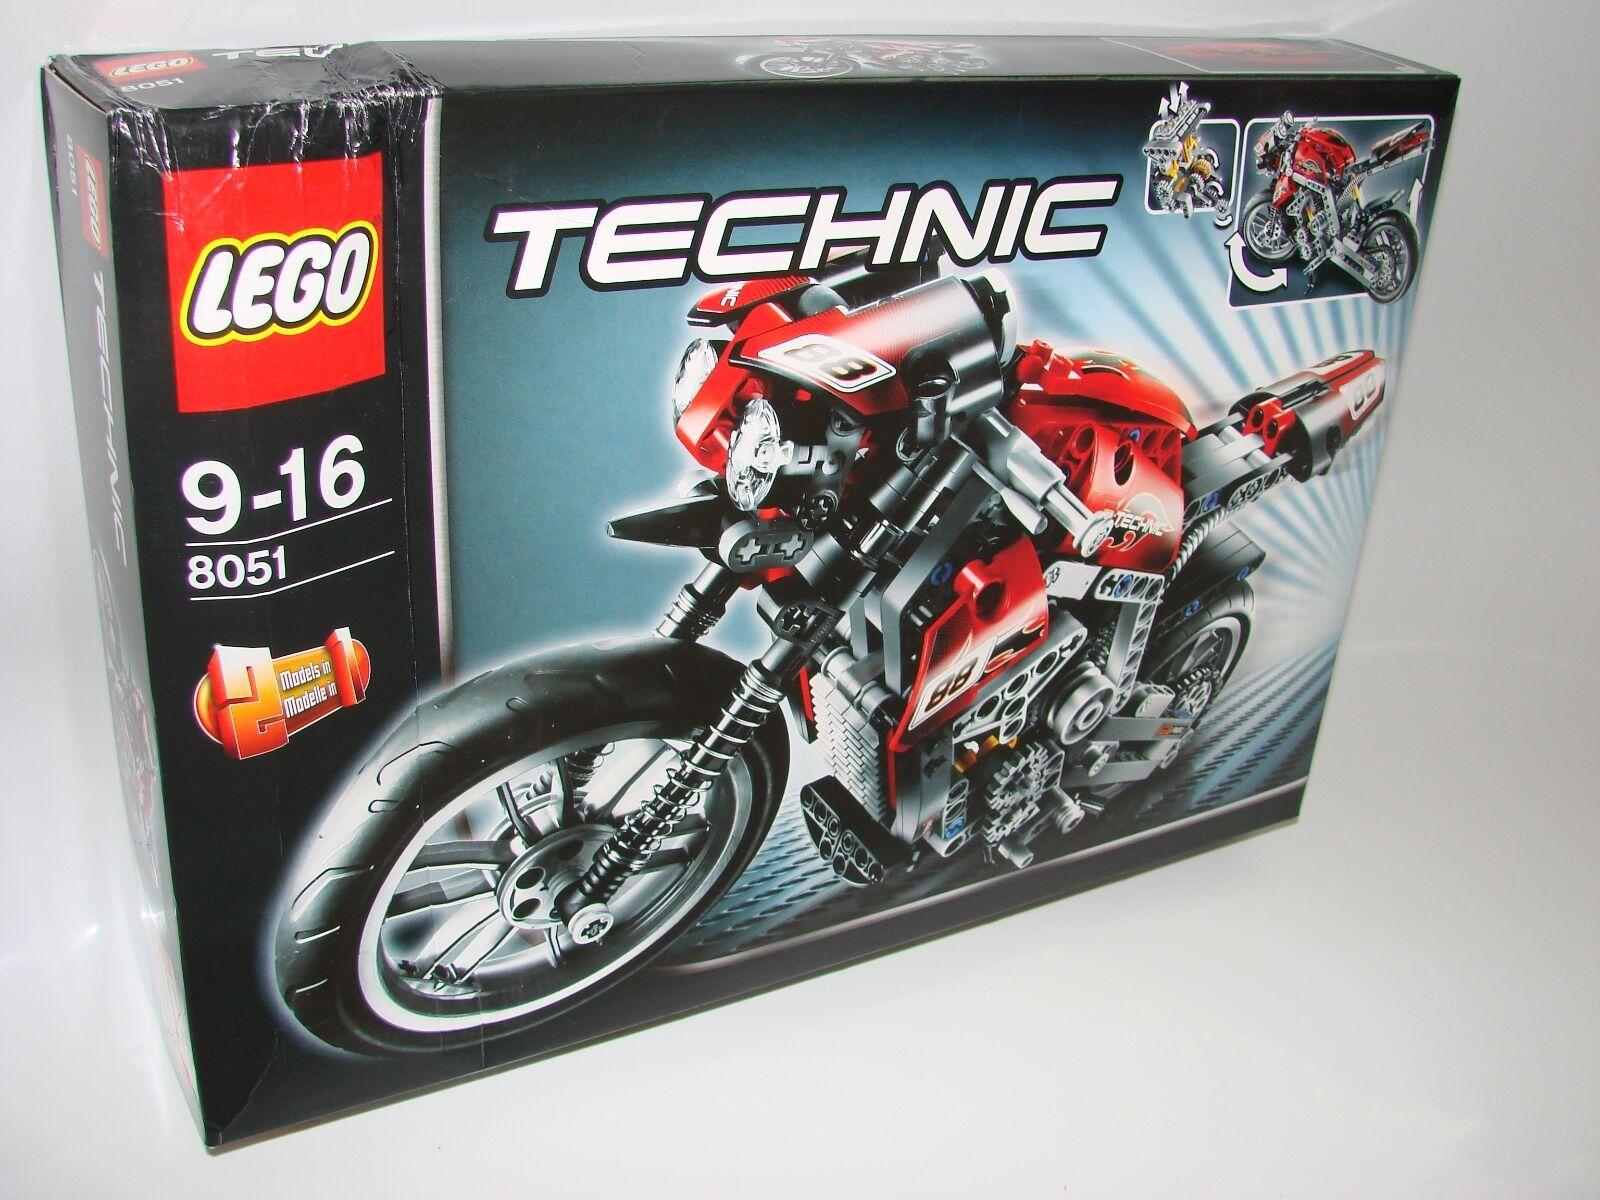 LEGO ® Technic Technology 8051 MOTO NUOVO 2te scelta _ Street Bike NEW BOX 2nd Choice